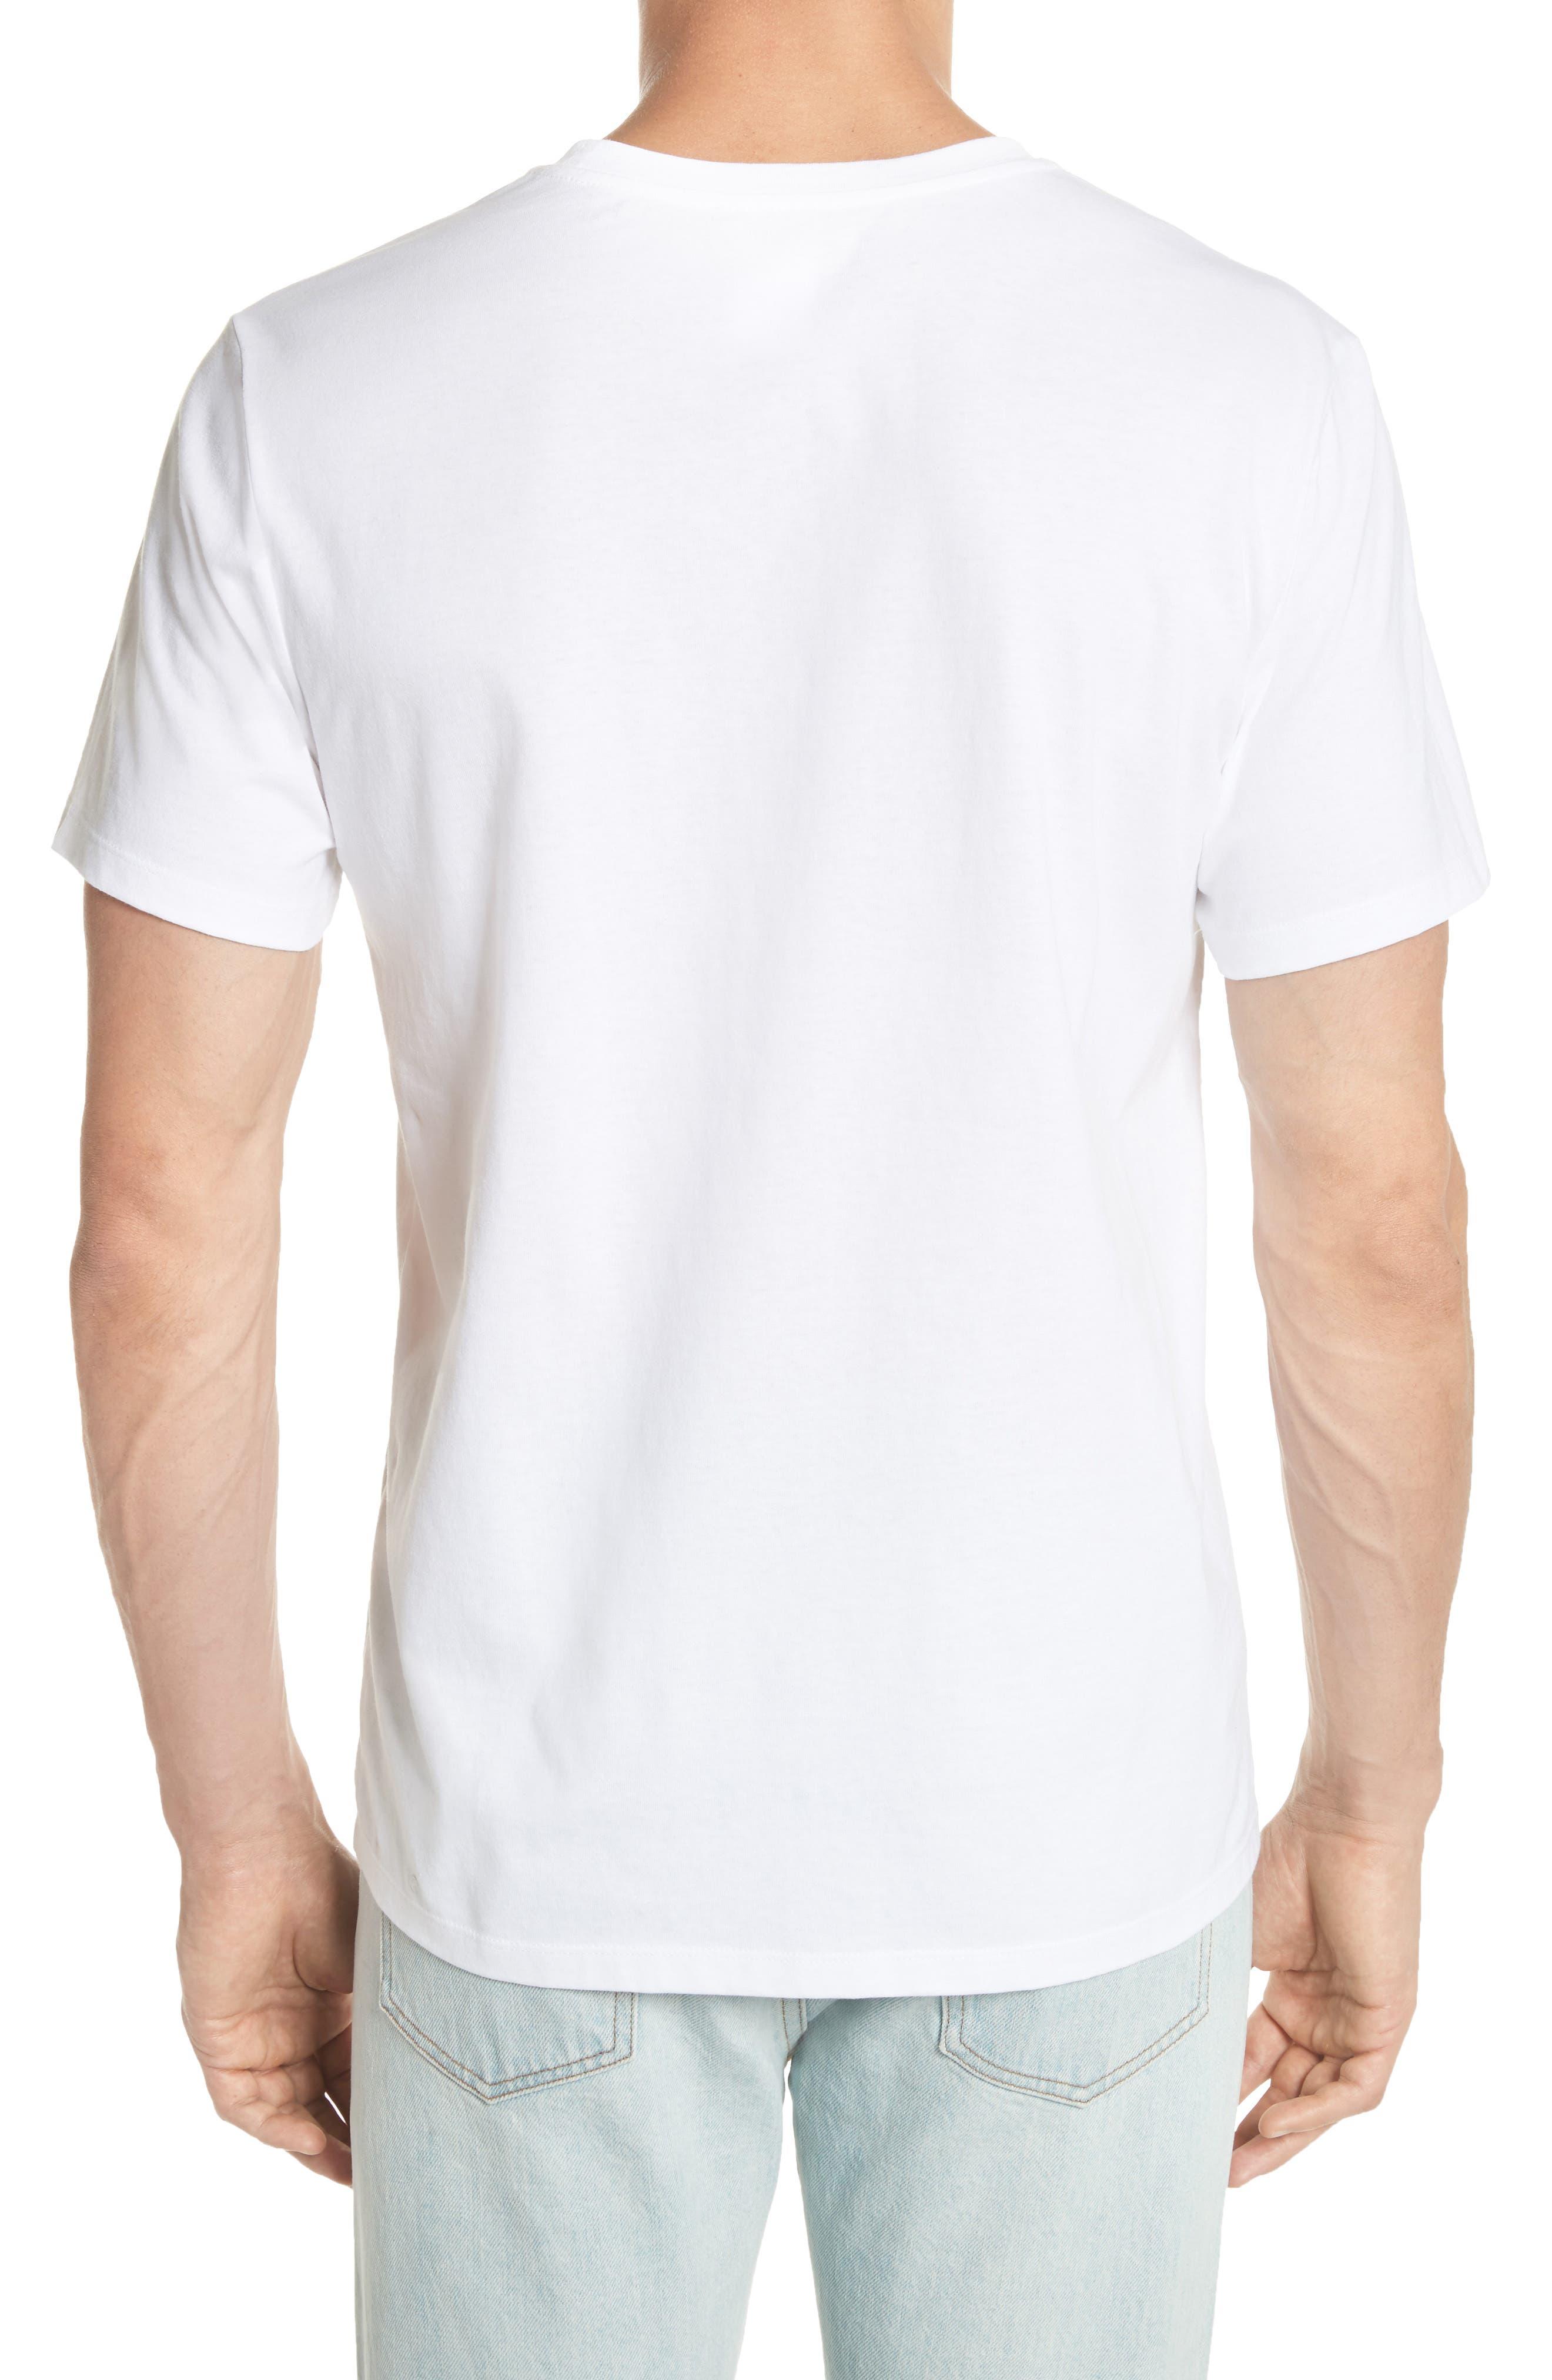 Tropicool Graphic T-Shirt,                             Alternate thumbnail 2, color,                             100